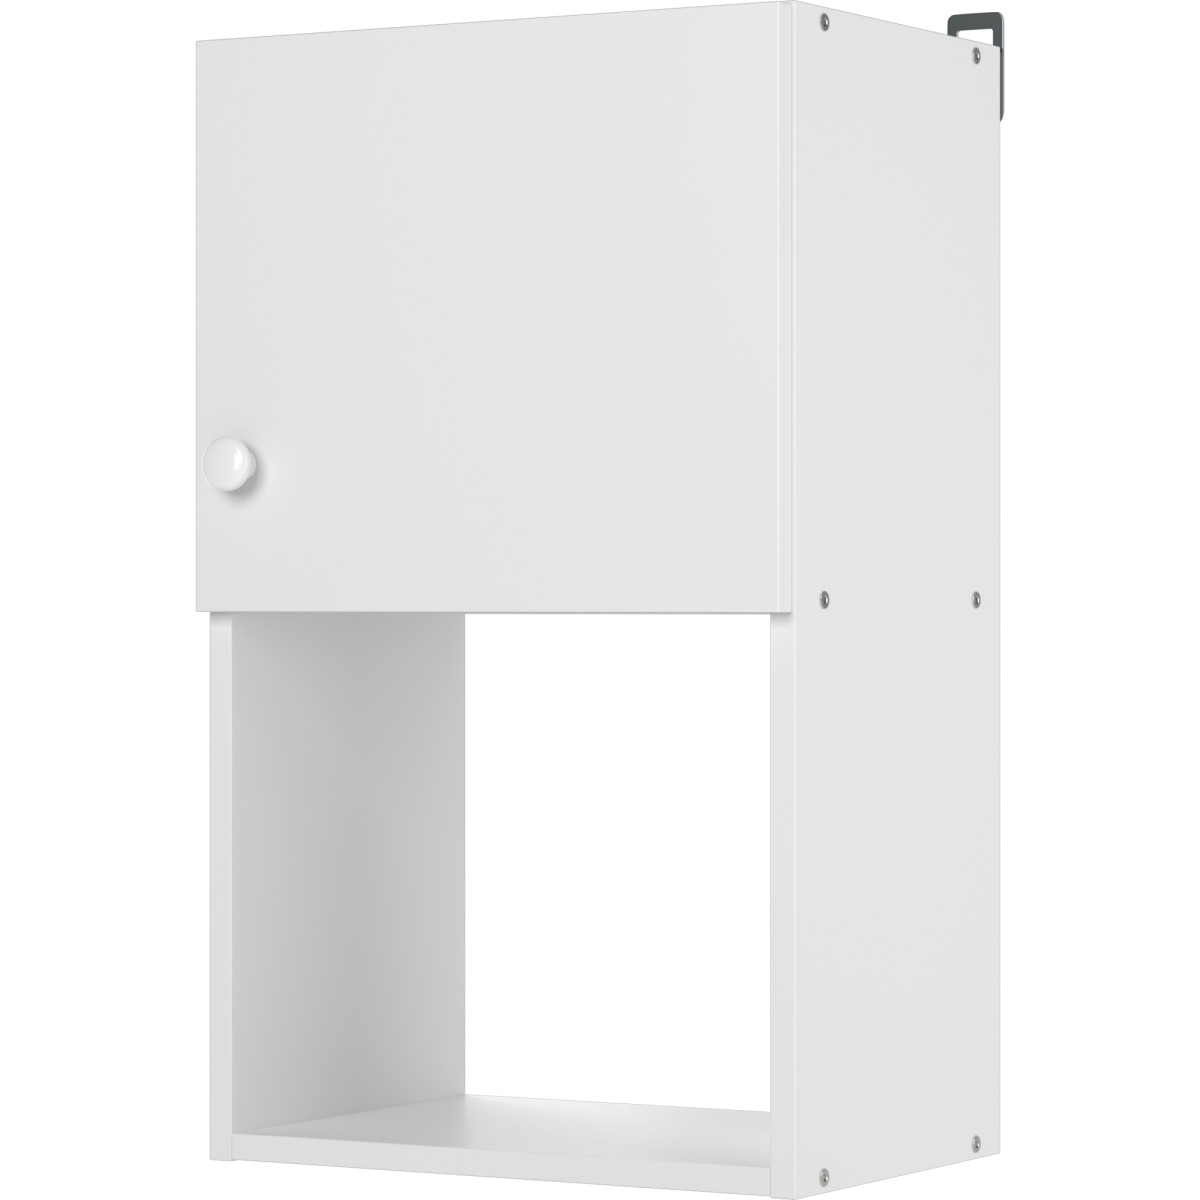 Шкаф навесной Бэлла 40x67.6x29 см ЛДСП цвет белый